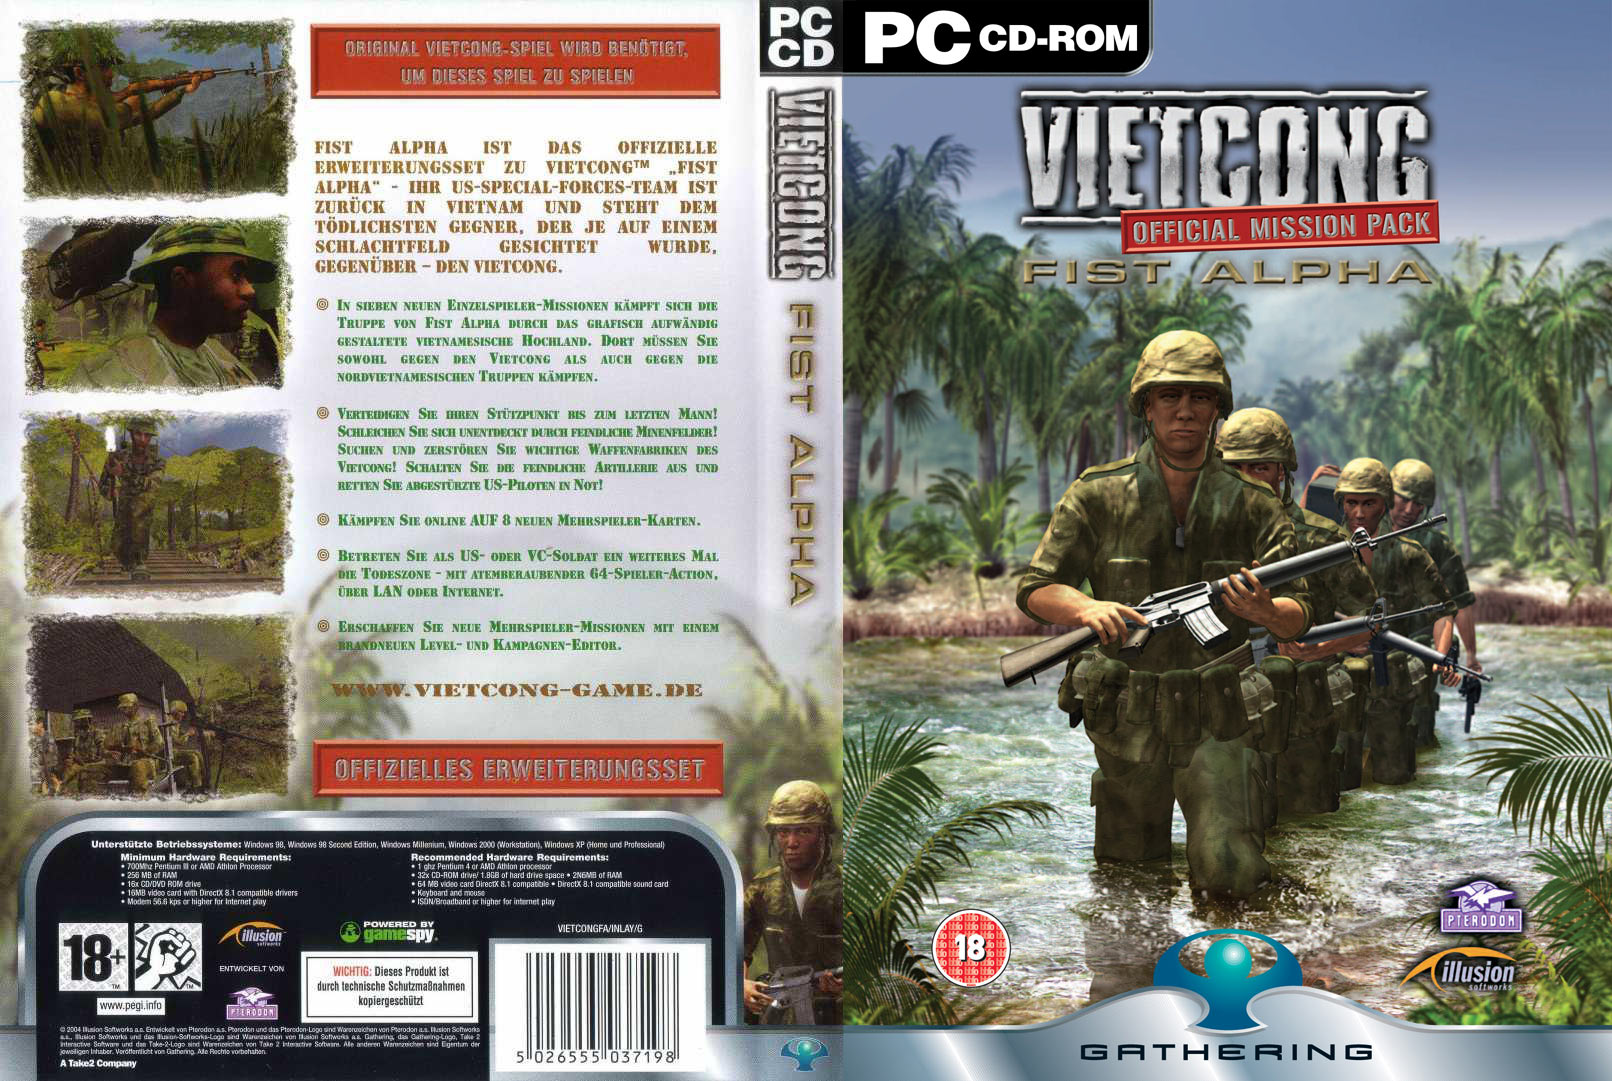 Vietcong fist alpha no cd